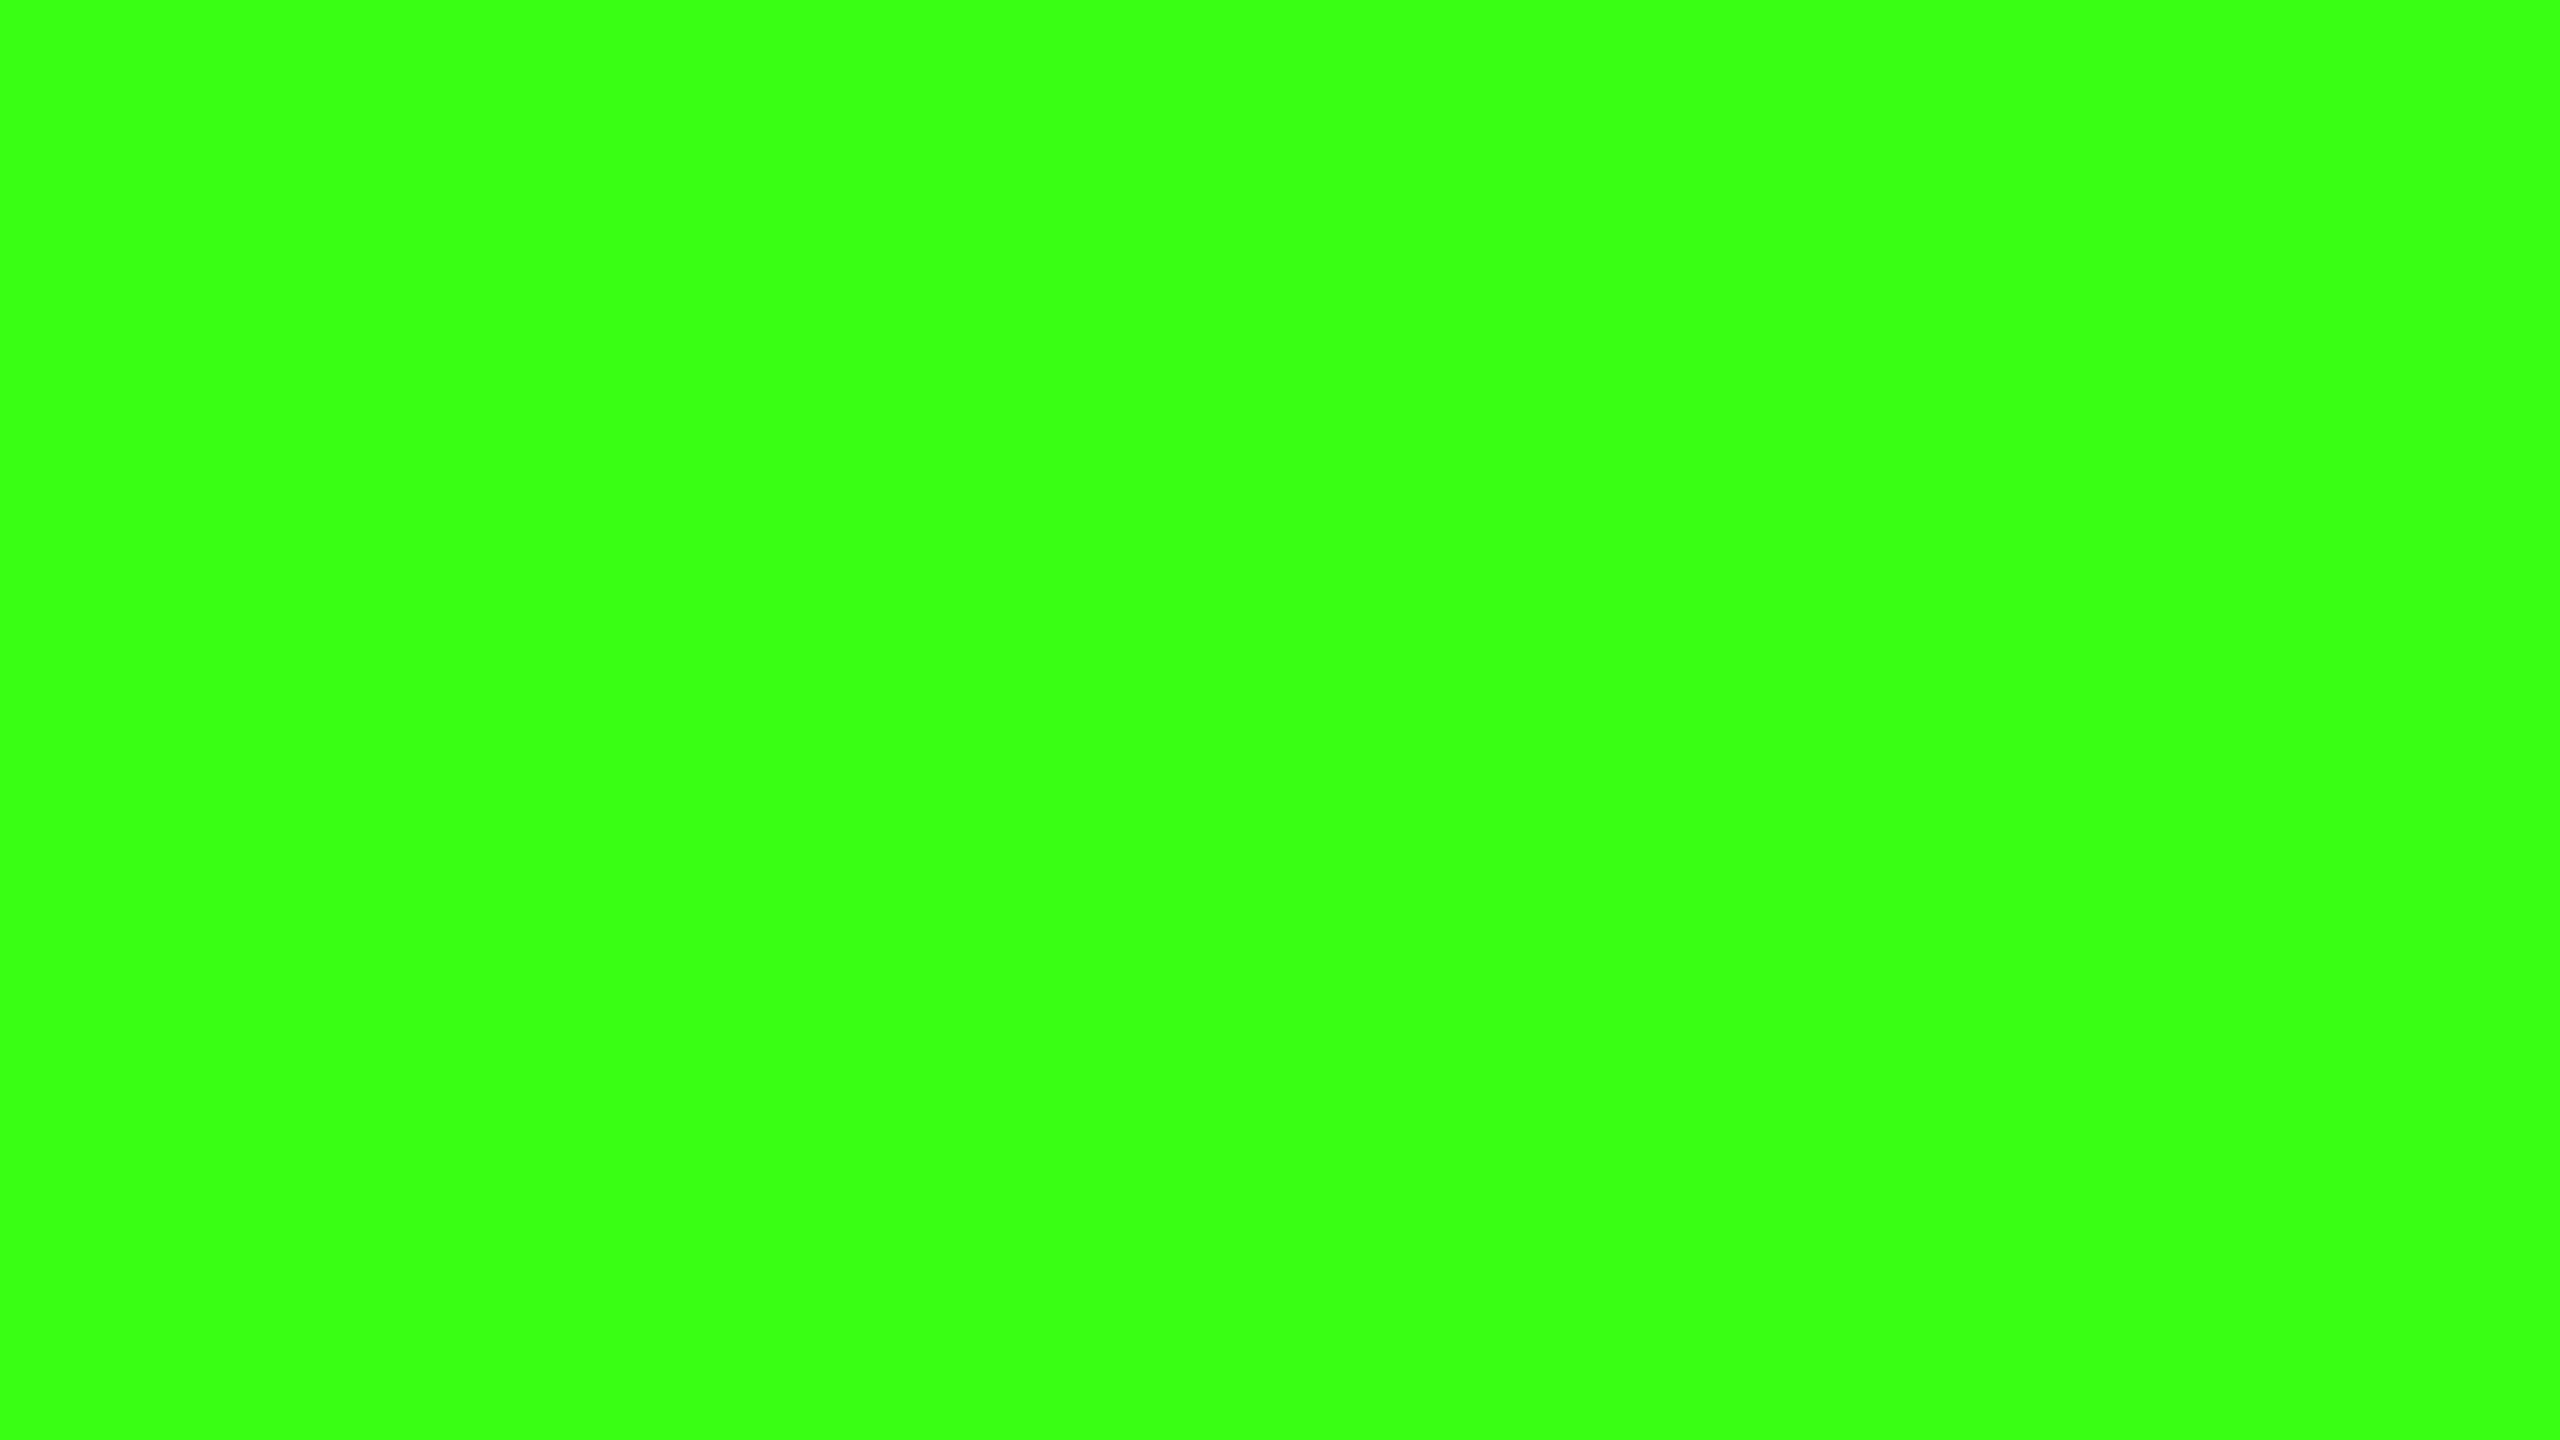 Plain Green Wallpapers Wallpaper Cave